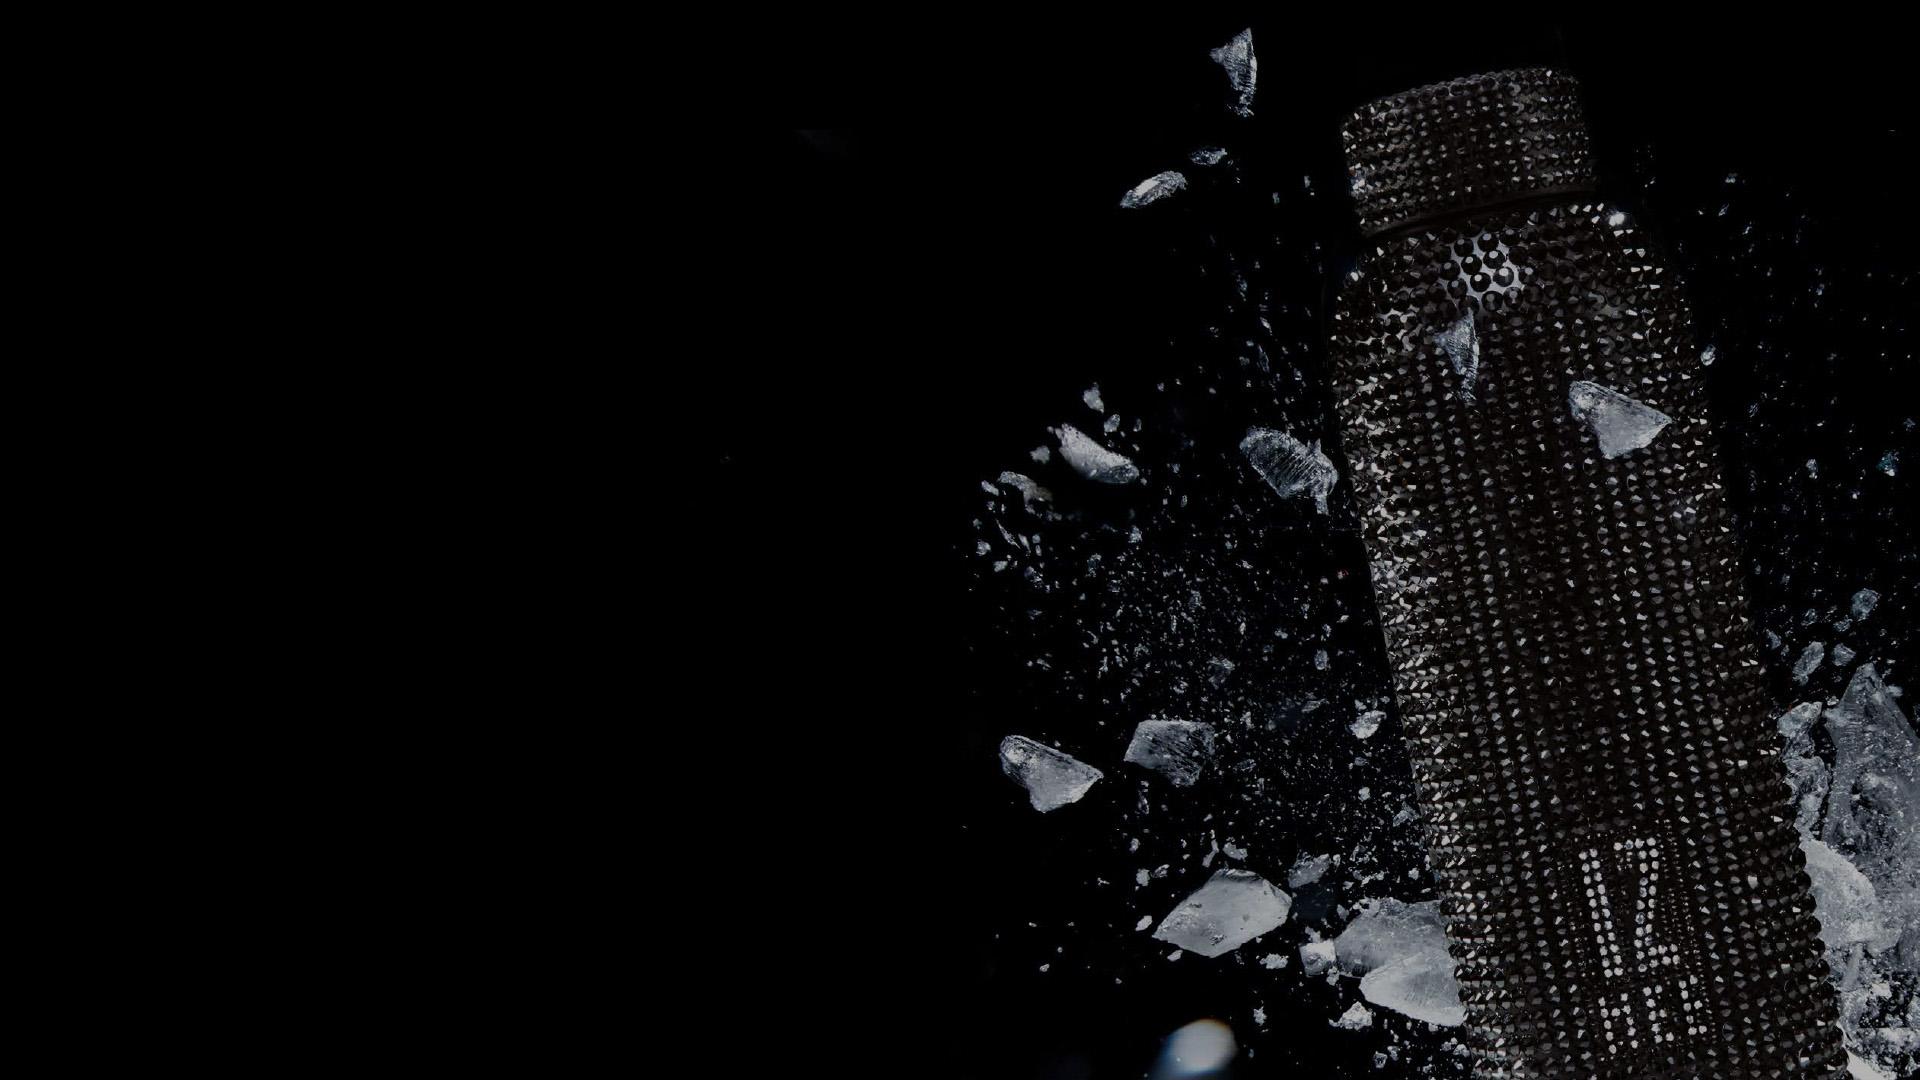 borraccia crystal con ghiaccio